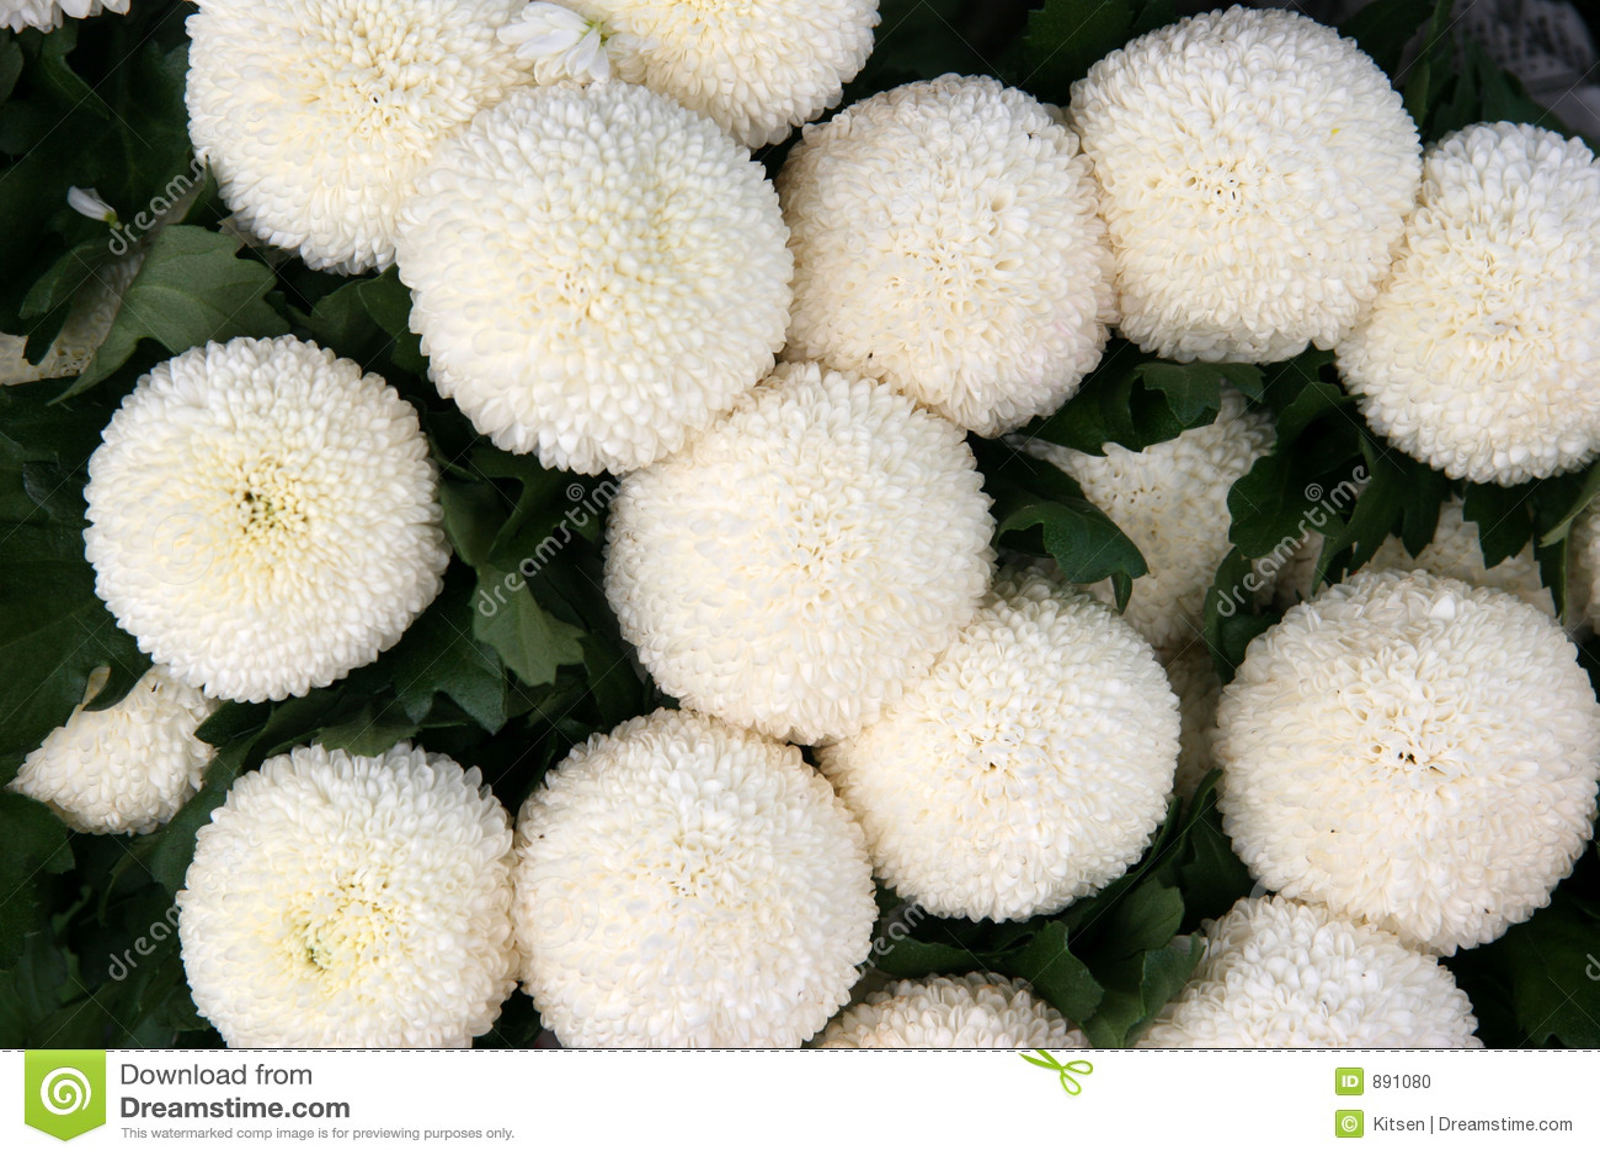 Ball chrysanthemums stock photo image of bloom farmed 891080 ball chrysanthemums mightylinksfo